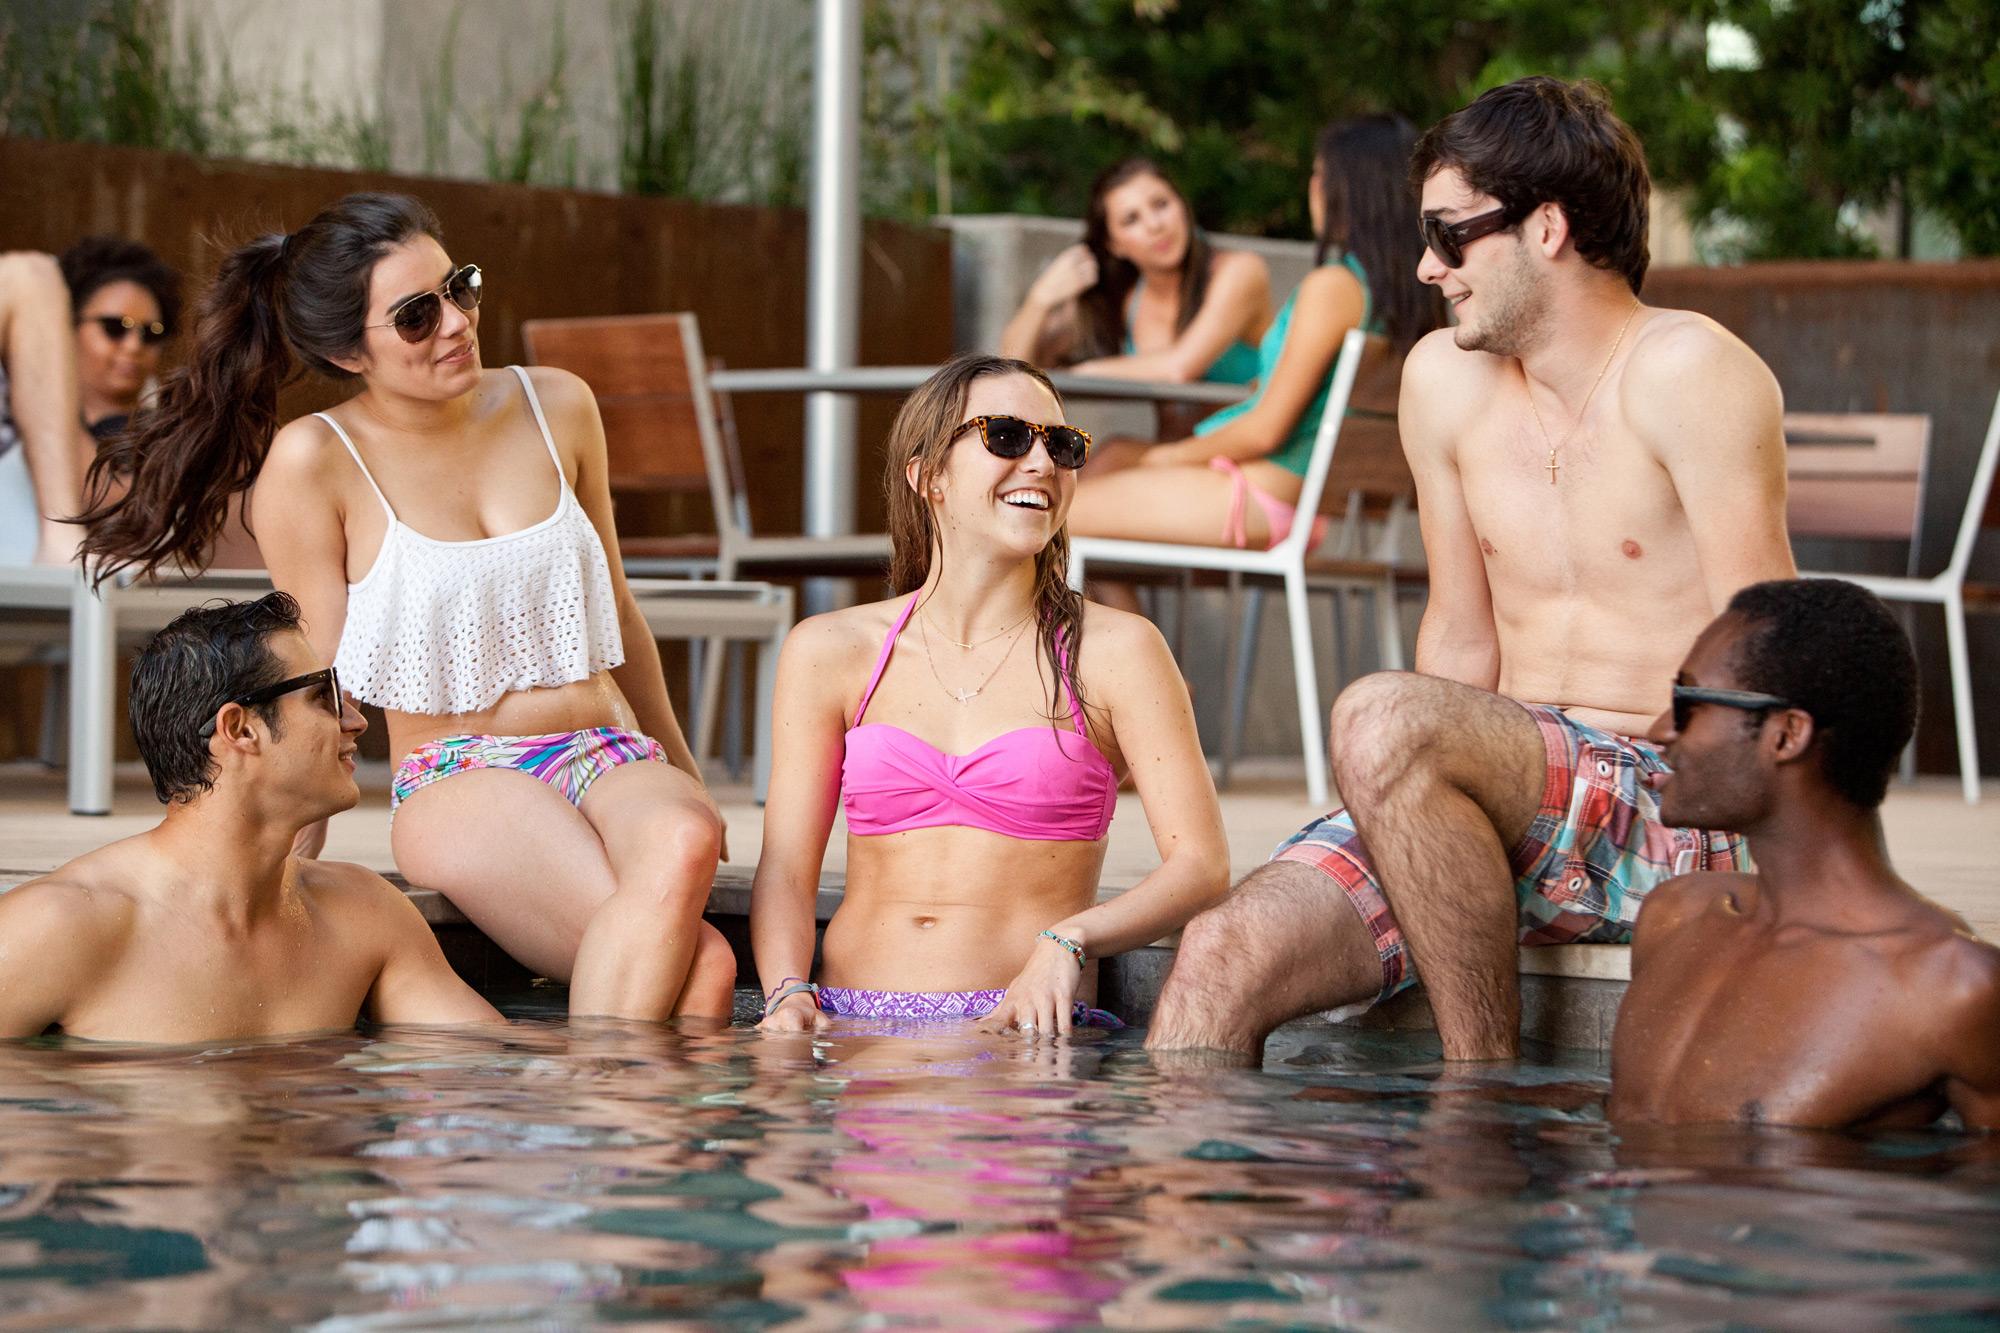 22_college_swimming_pool.jpg